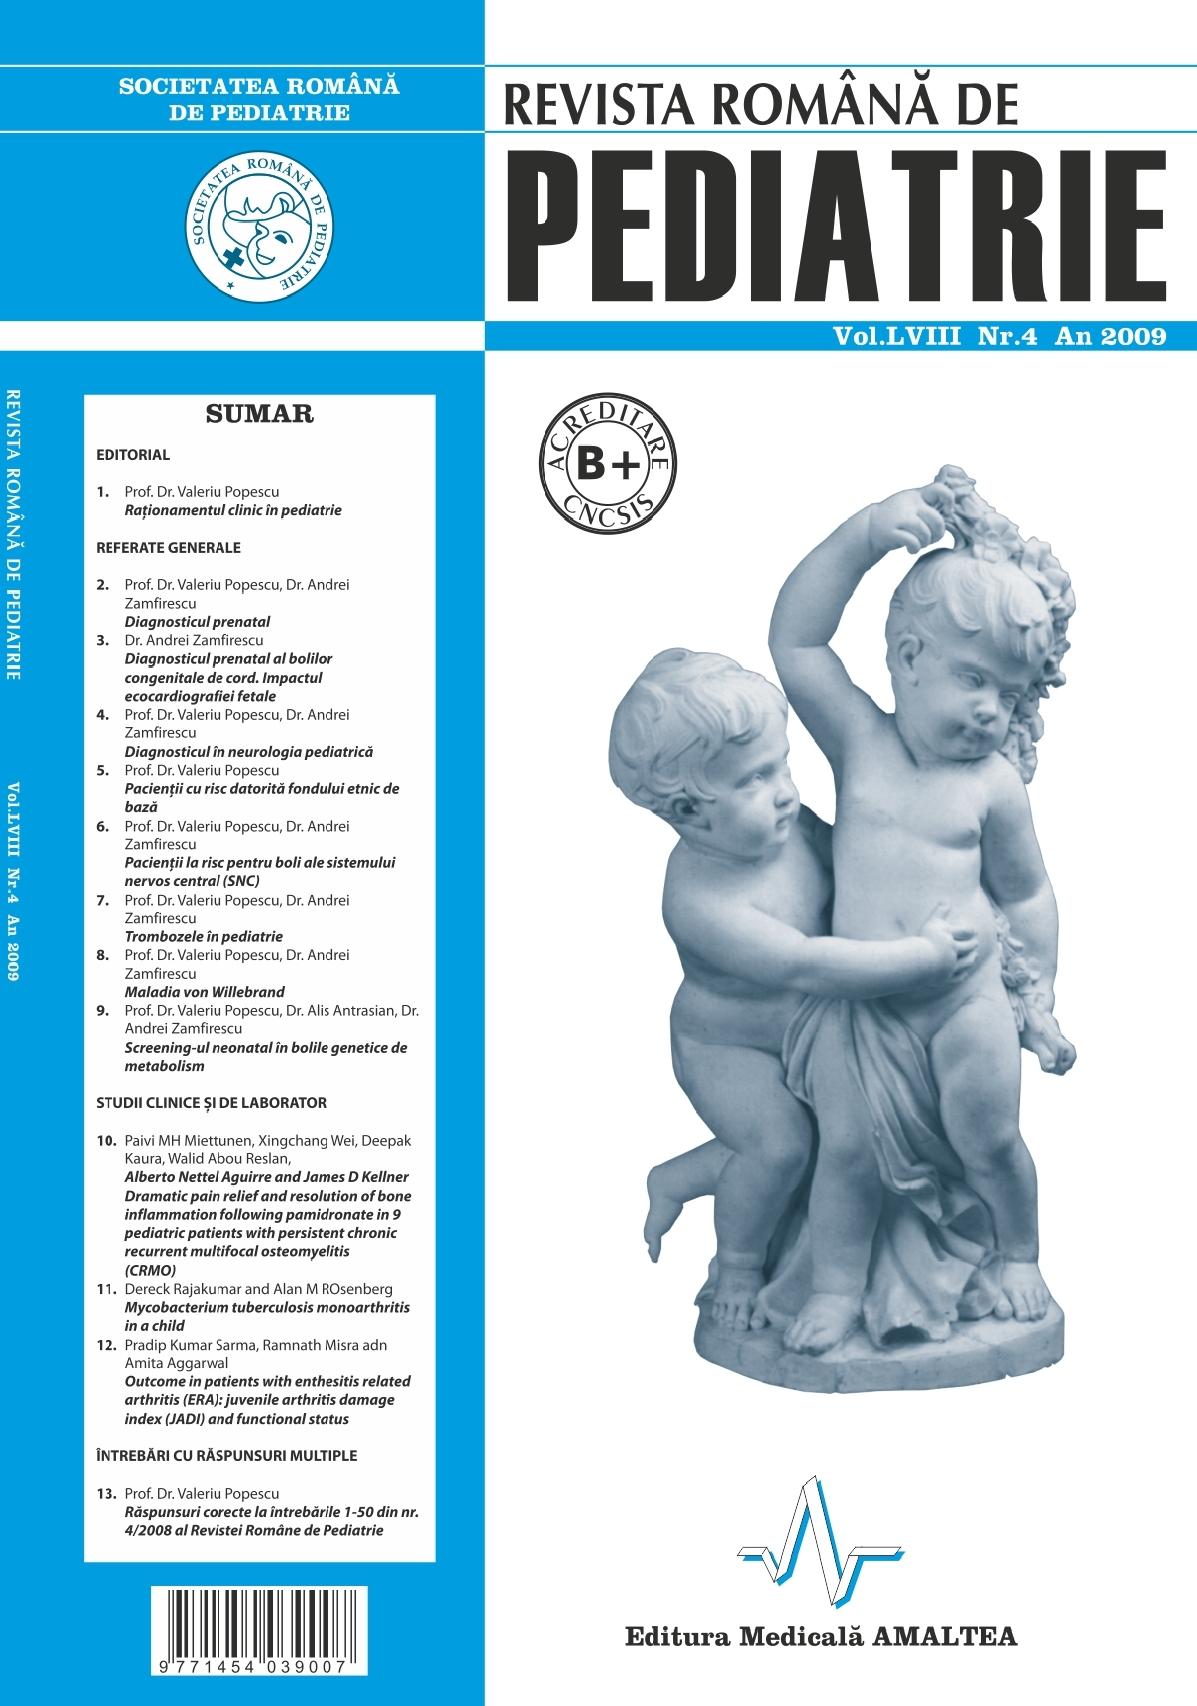 Revista Romana de PEDIATRIE | Volumul LVIII, Nr. 4, An 2009